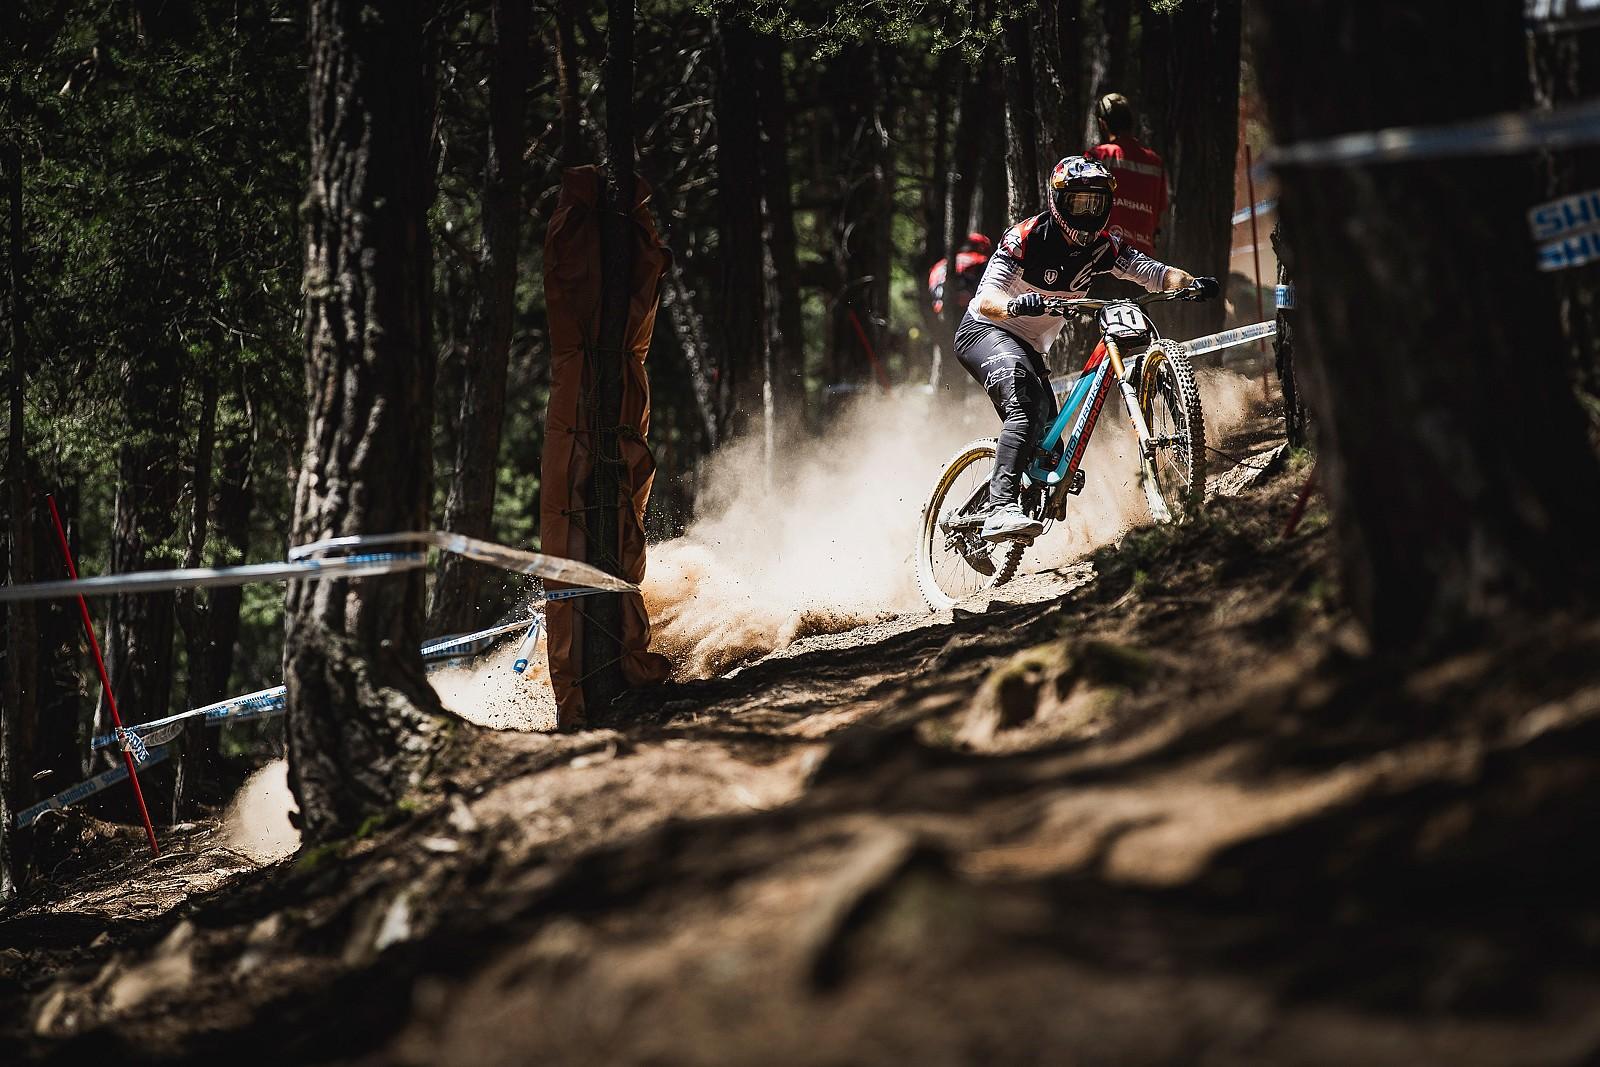 Pure Bulldog - Brook Macdonald - A Big Bad Batch of Brook Macdonald Bangers - Mountain Biking Pictures - Vital MTB